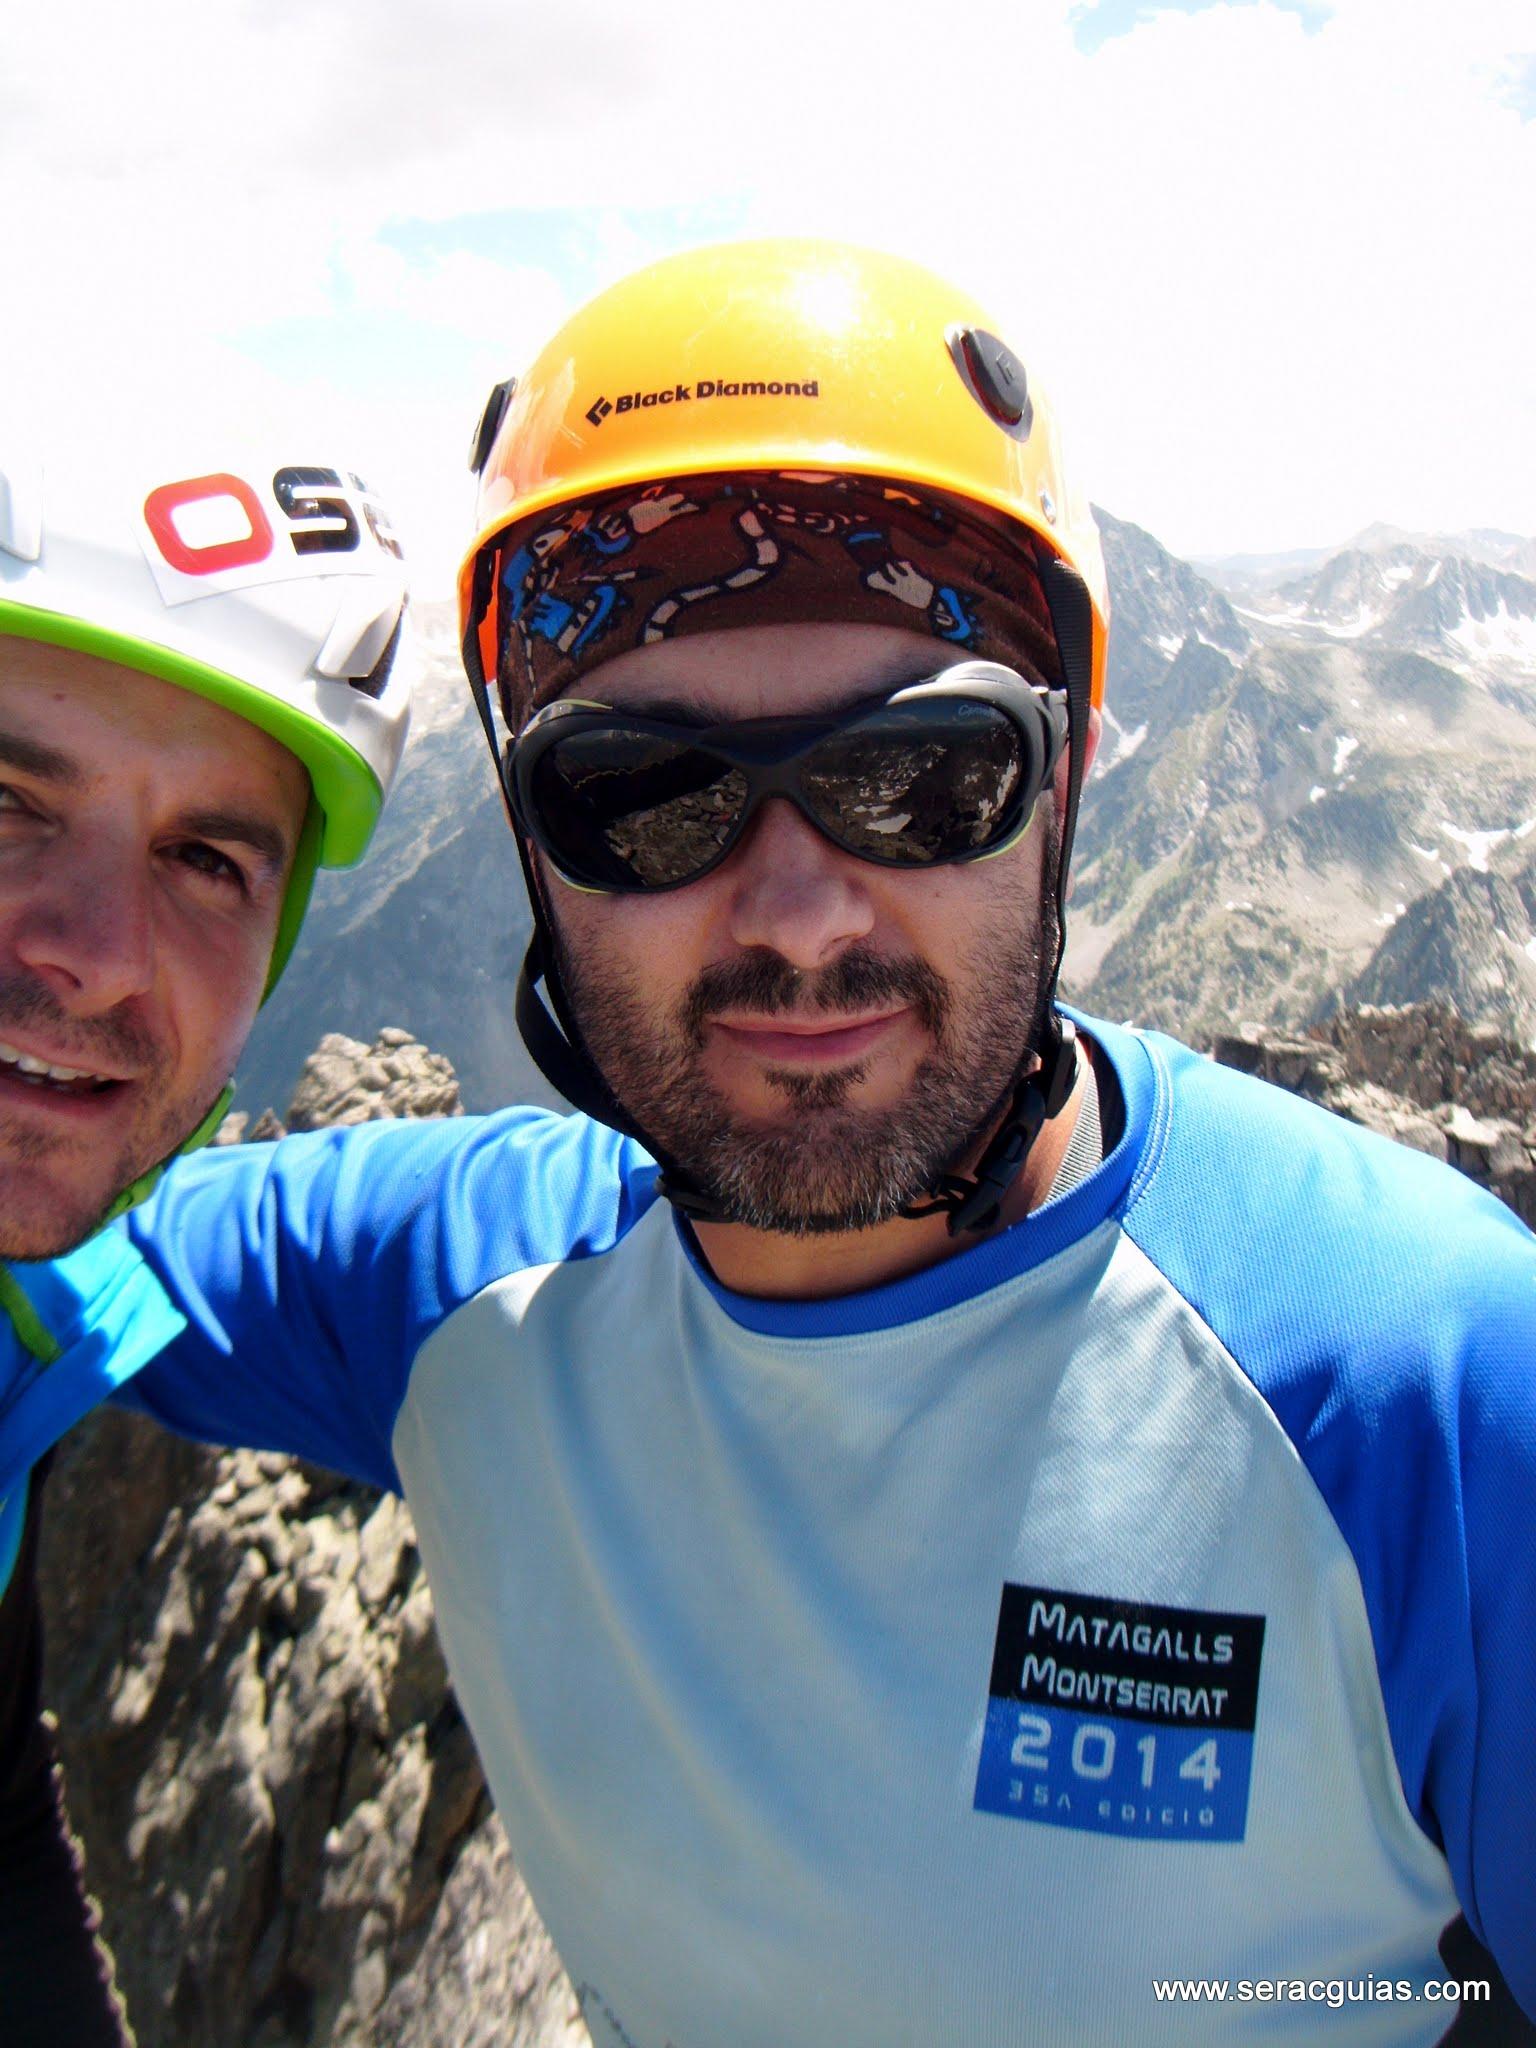 Cresta Basiero Amitges Pirineo 13 SERAC COMPAÑÍA DE GUÍAS